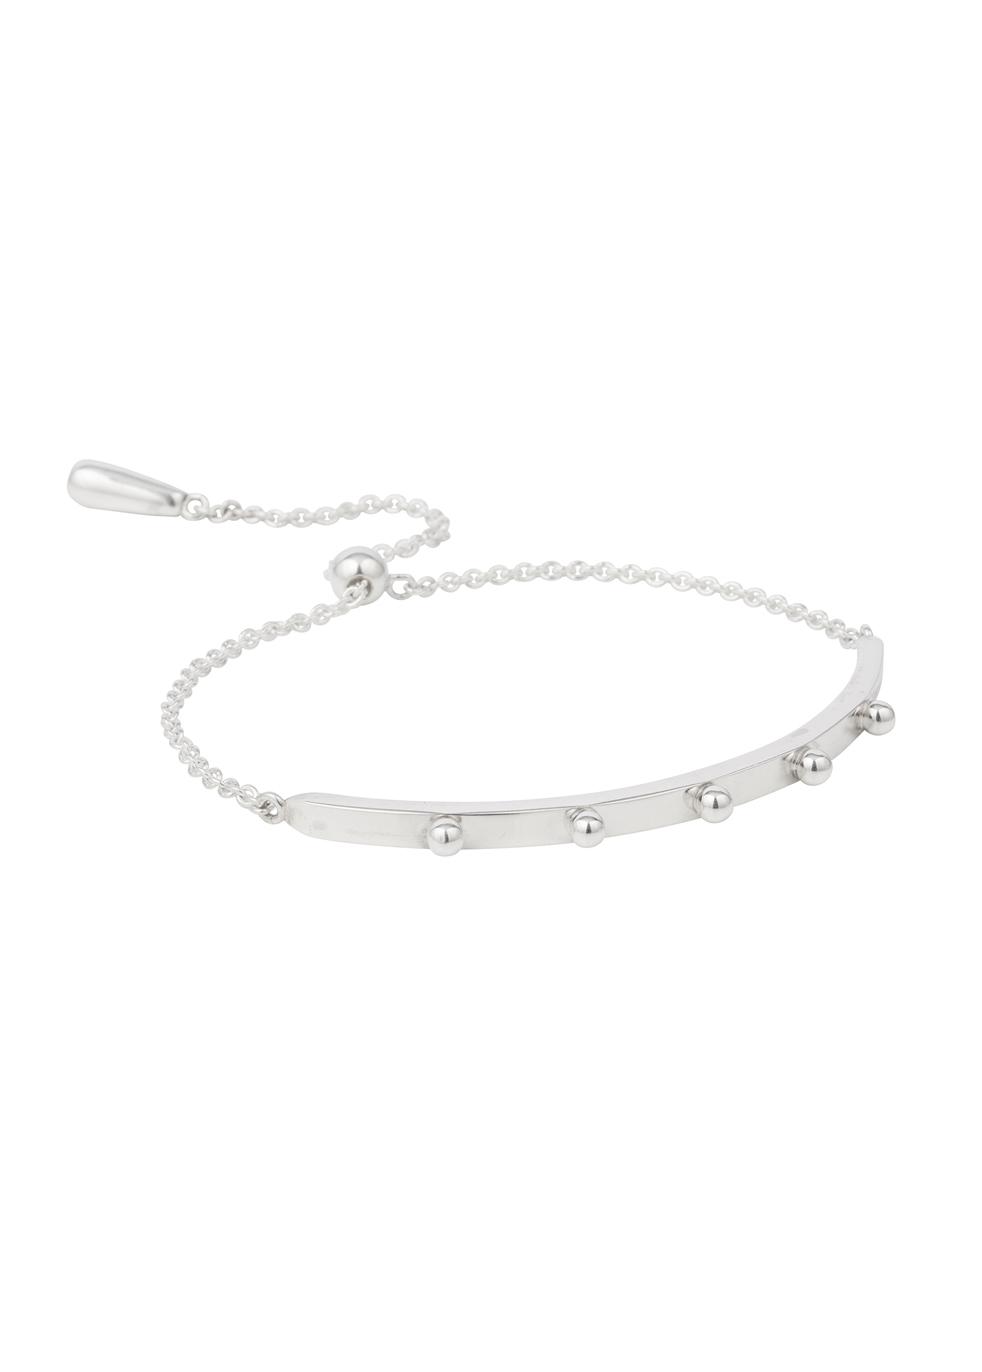 SUSAN CAPLAN CONTEMPORARY Athena Infinity Bracelet